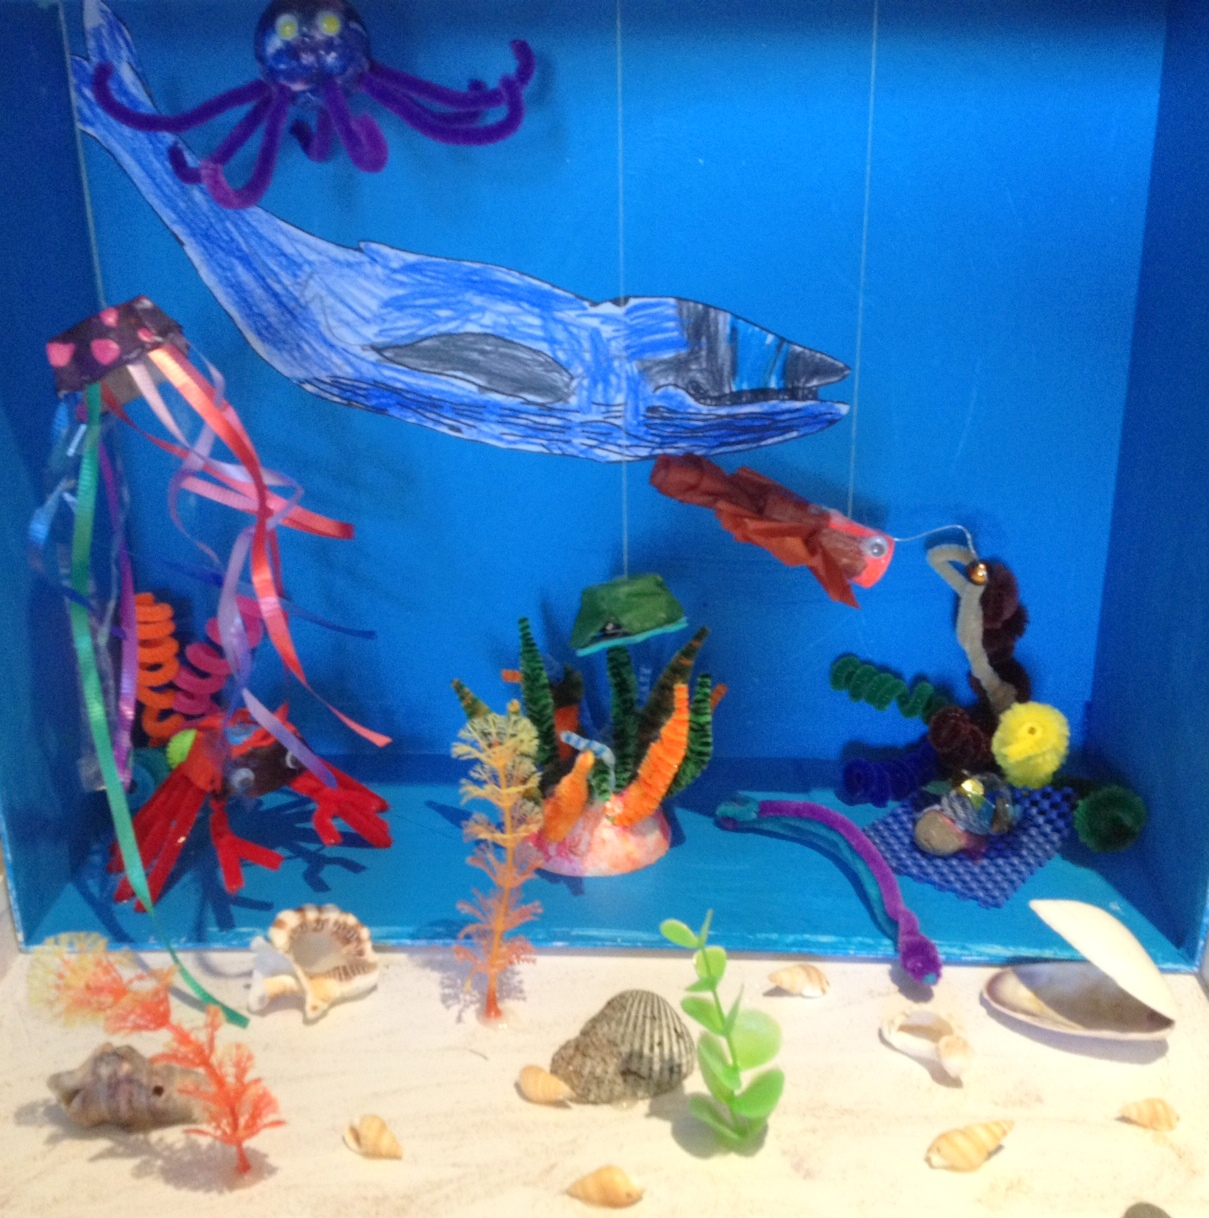 top ocean habitat diorama - photo #7